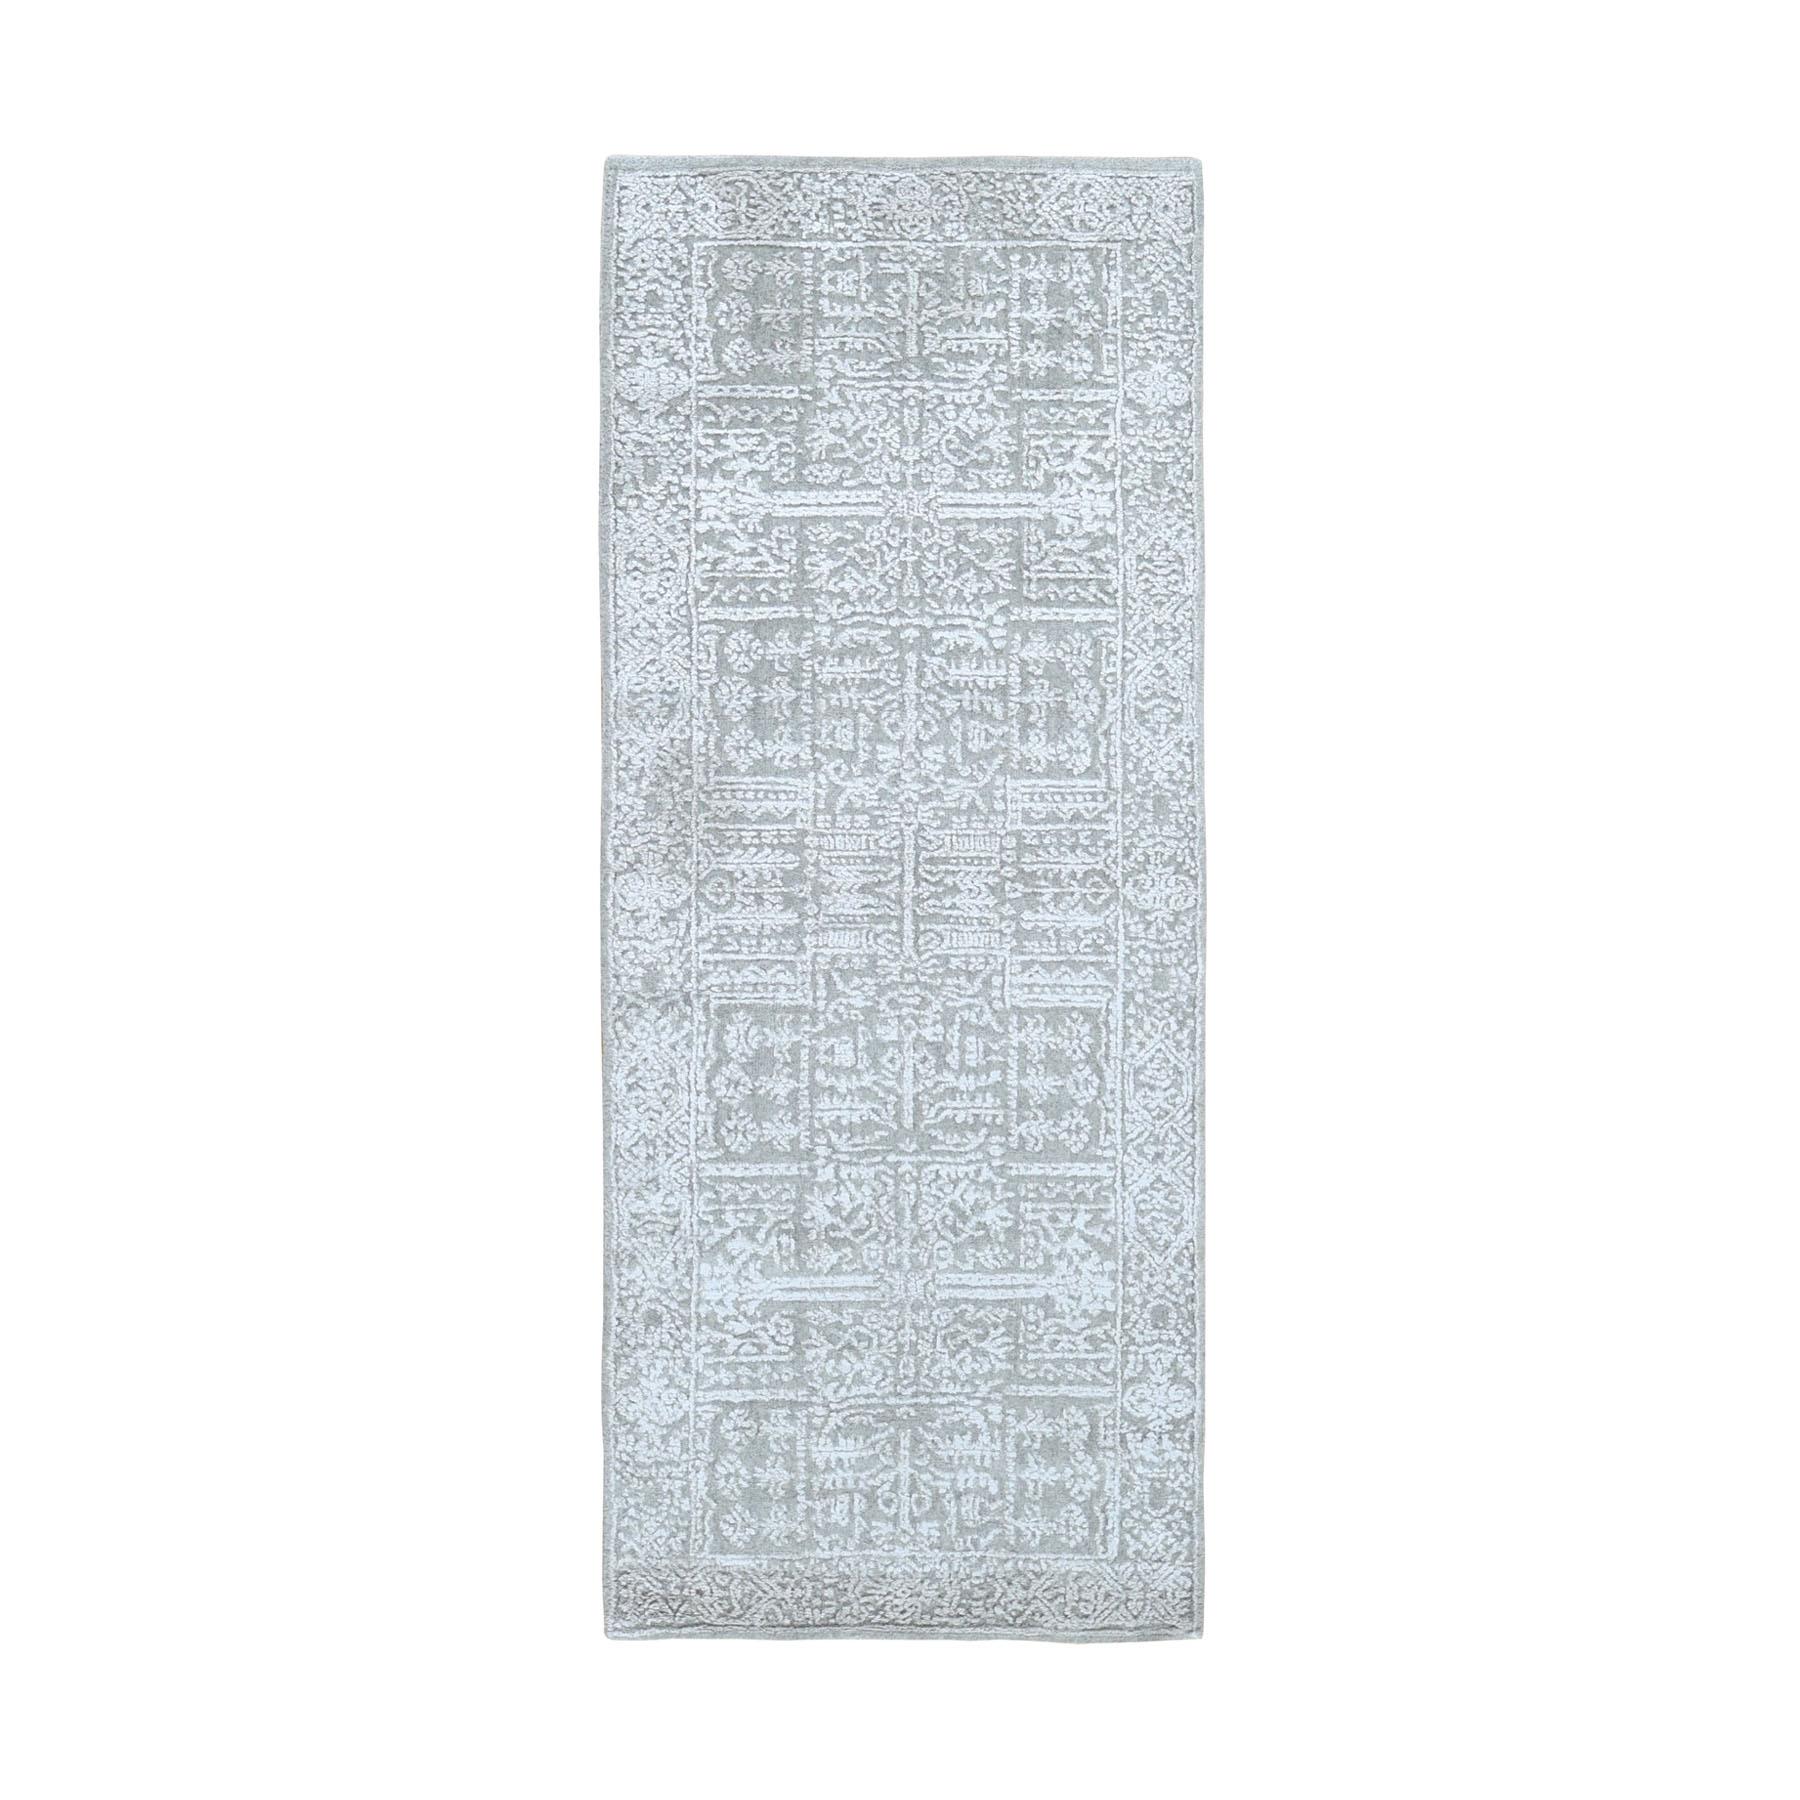 "2'5""X6'1""  Gray Fine Jacquard Hand Loomed Modern Wool And Art Silk Runner Oriental Rug moad9e76"